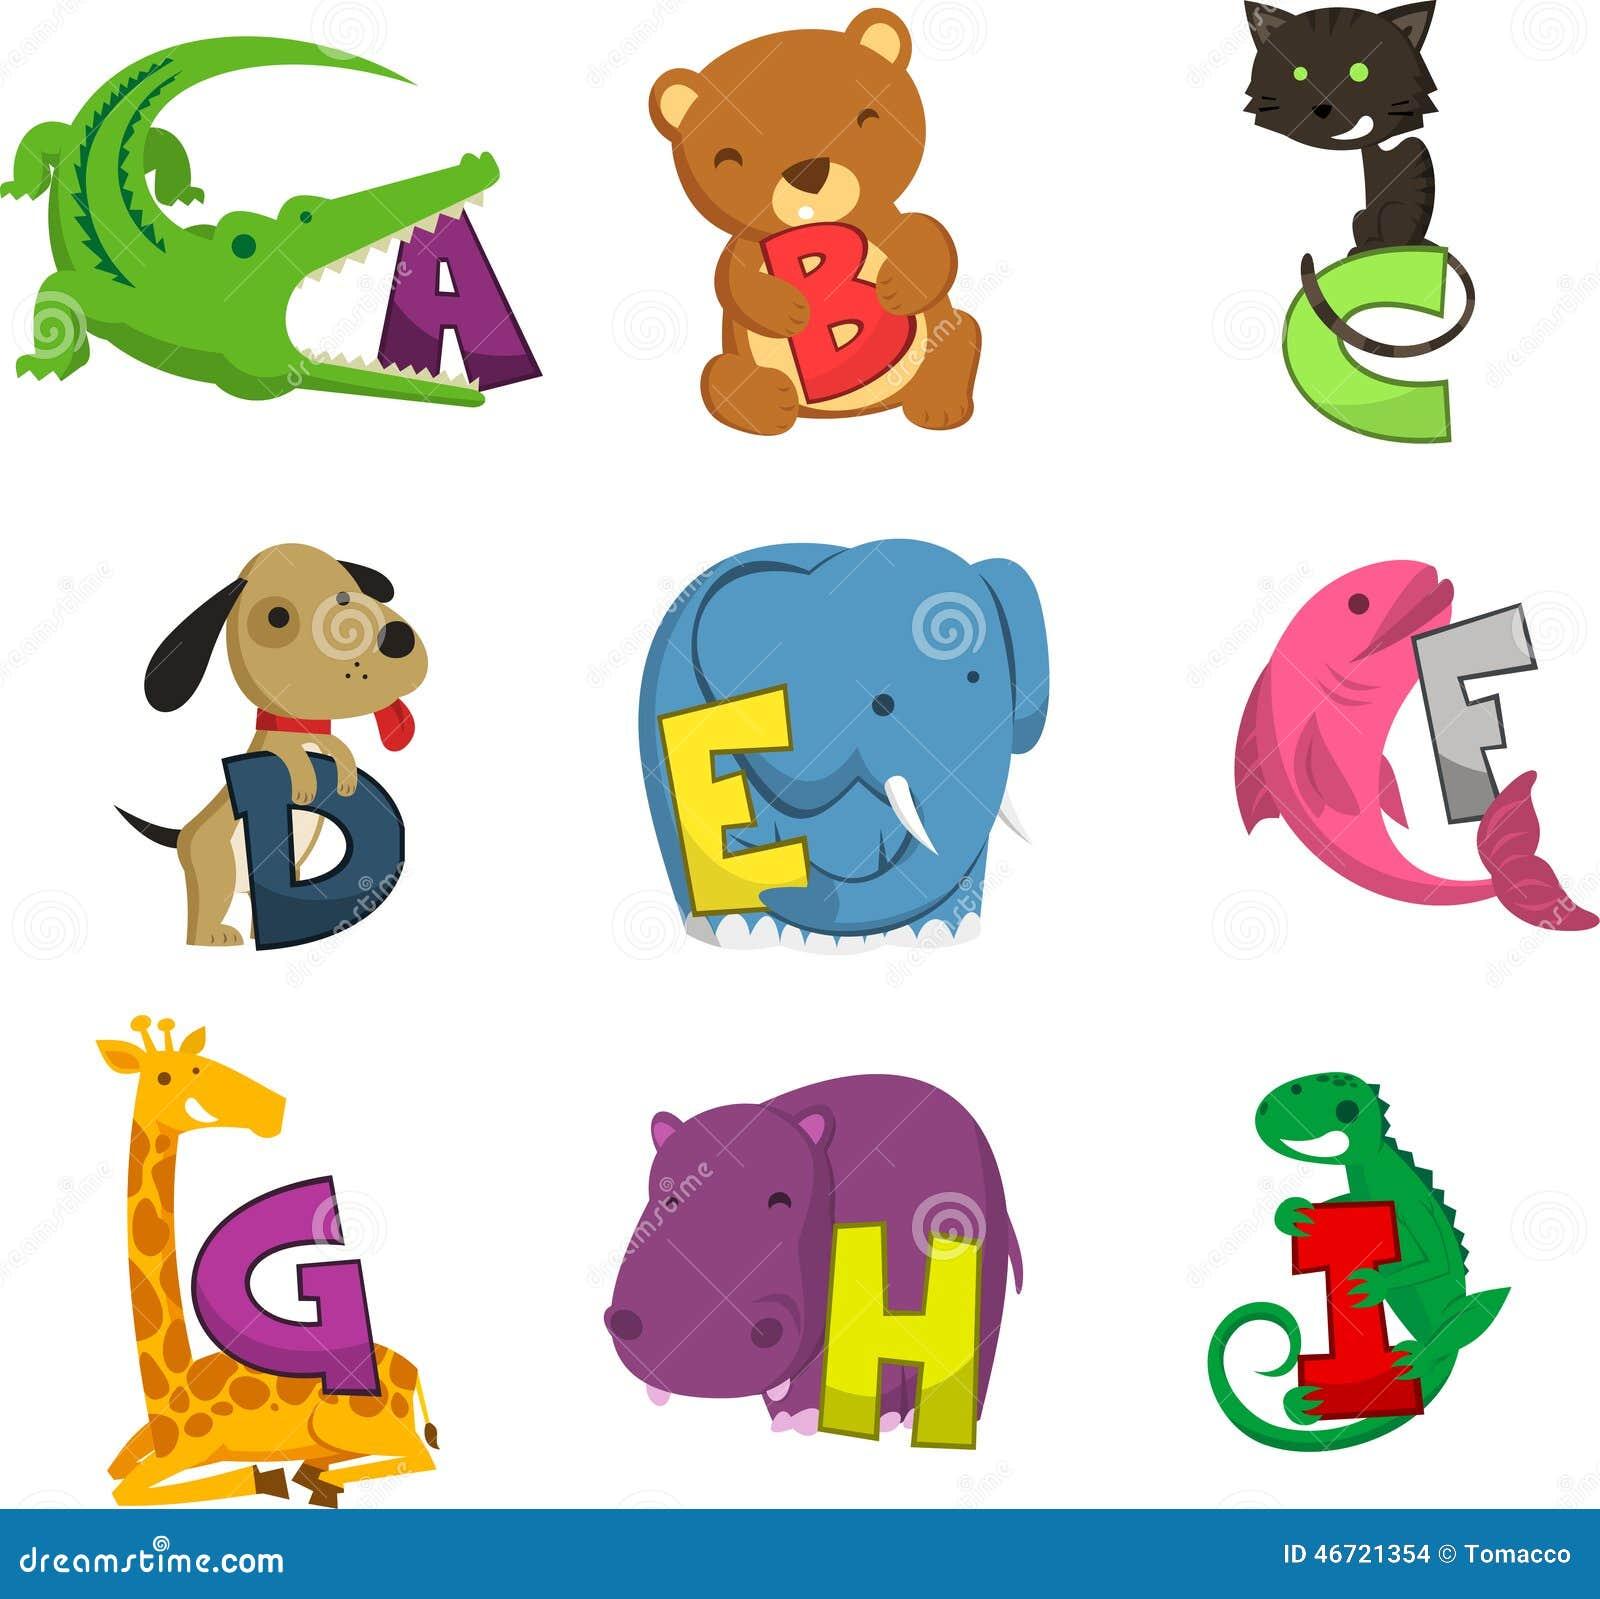 animal alphabet alphabetical list of animals stock illustration animal alphabet alphabetical list of animals